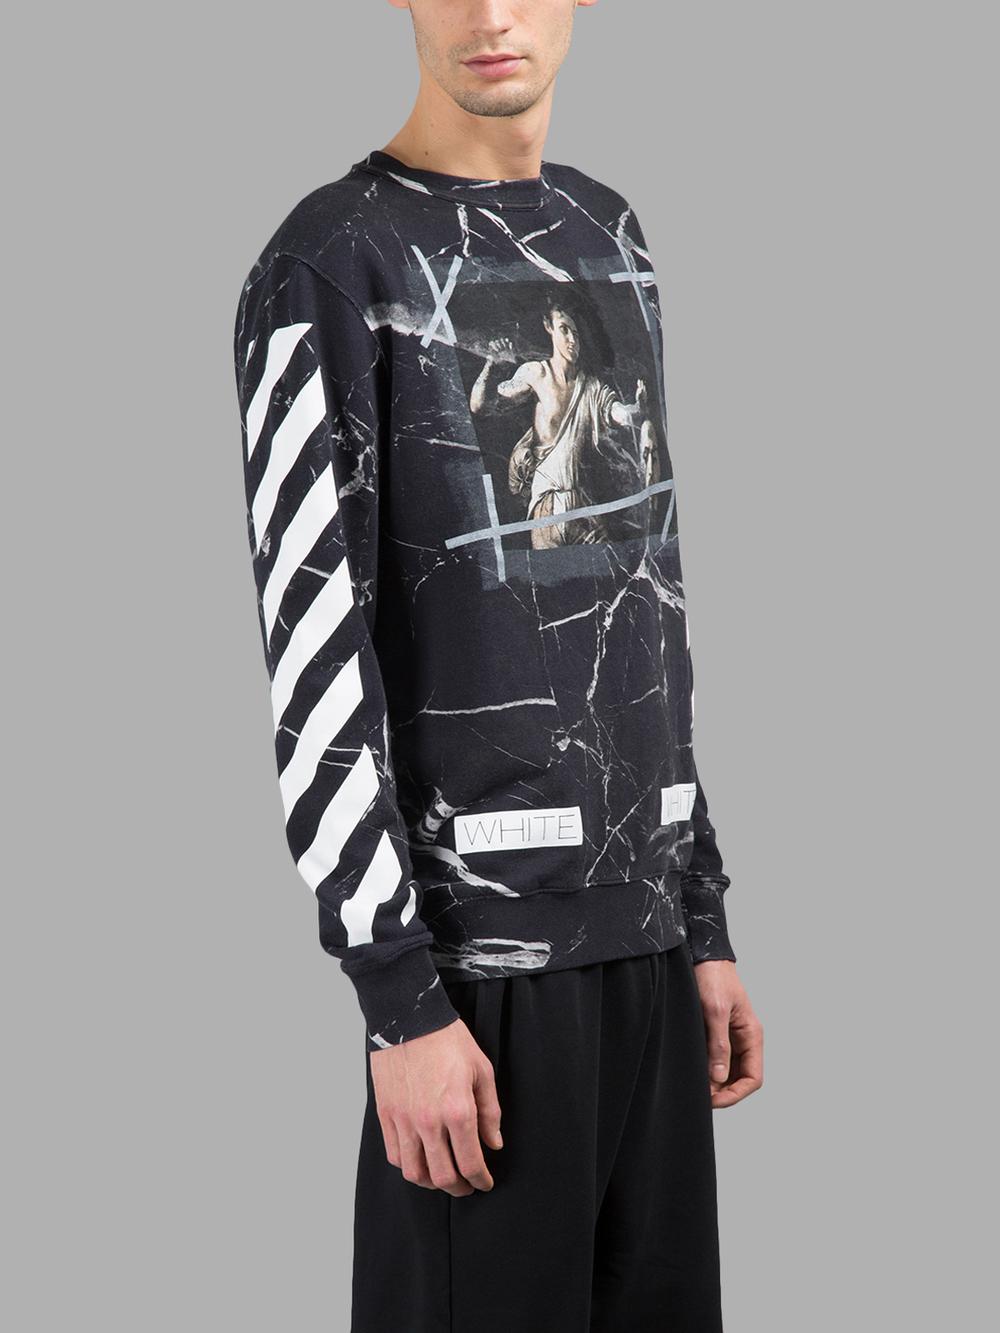 OFF-WHITE C O VIRGIL ABLOH - Sweaters 61e03d5e1ac9